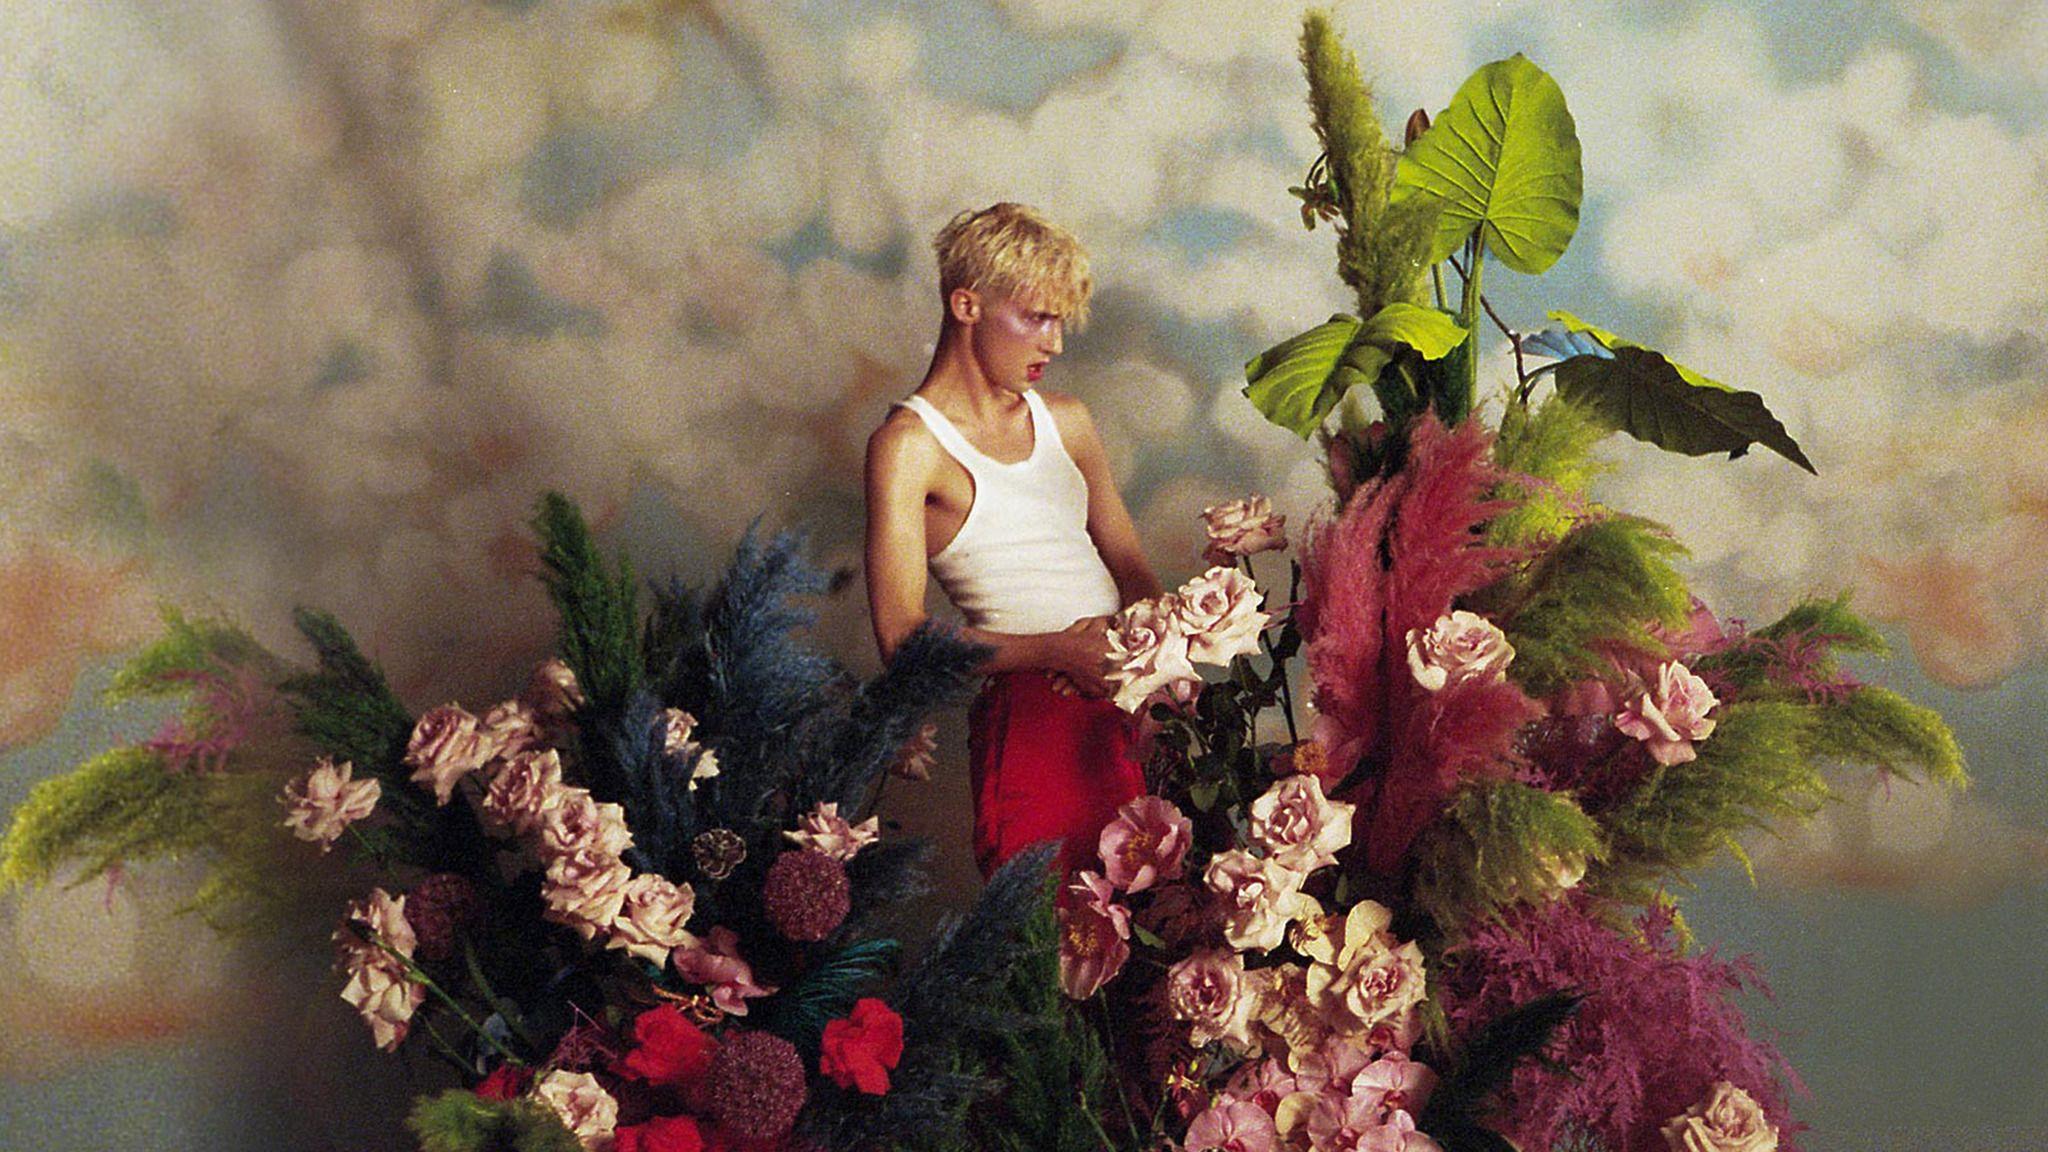 Troye Sivan: The Bloom Tour